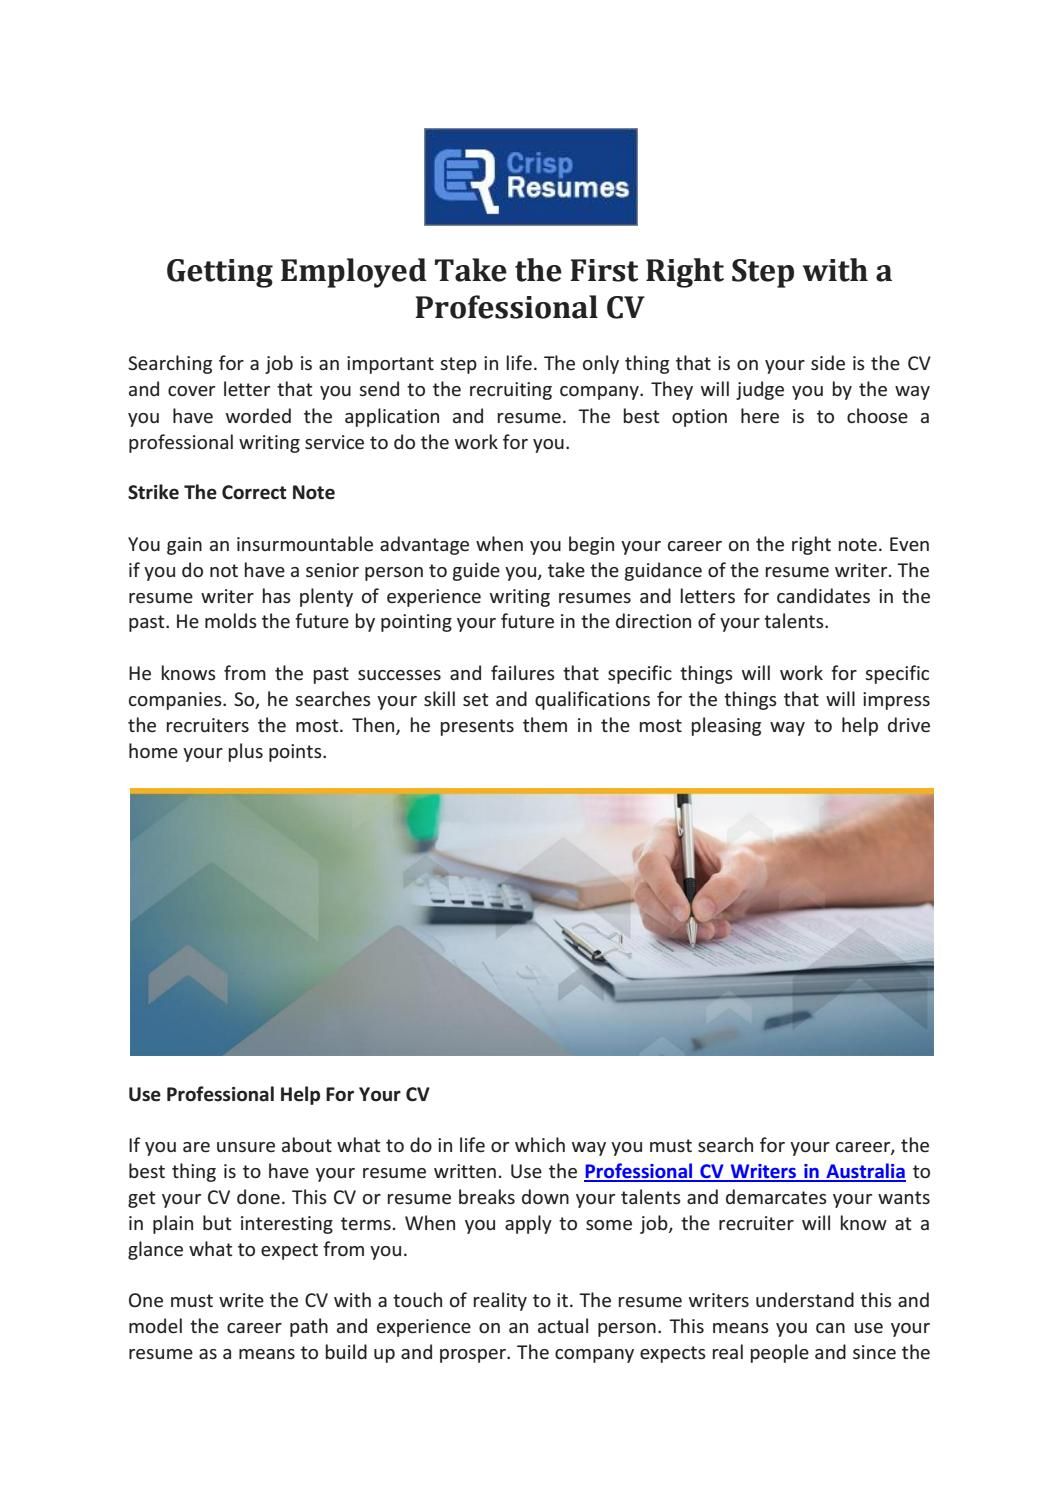 Professional CV writers in australia by Abhinav Bajaj - issuu